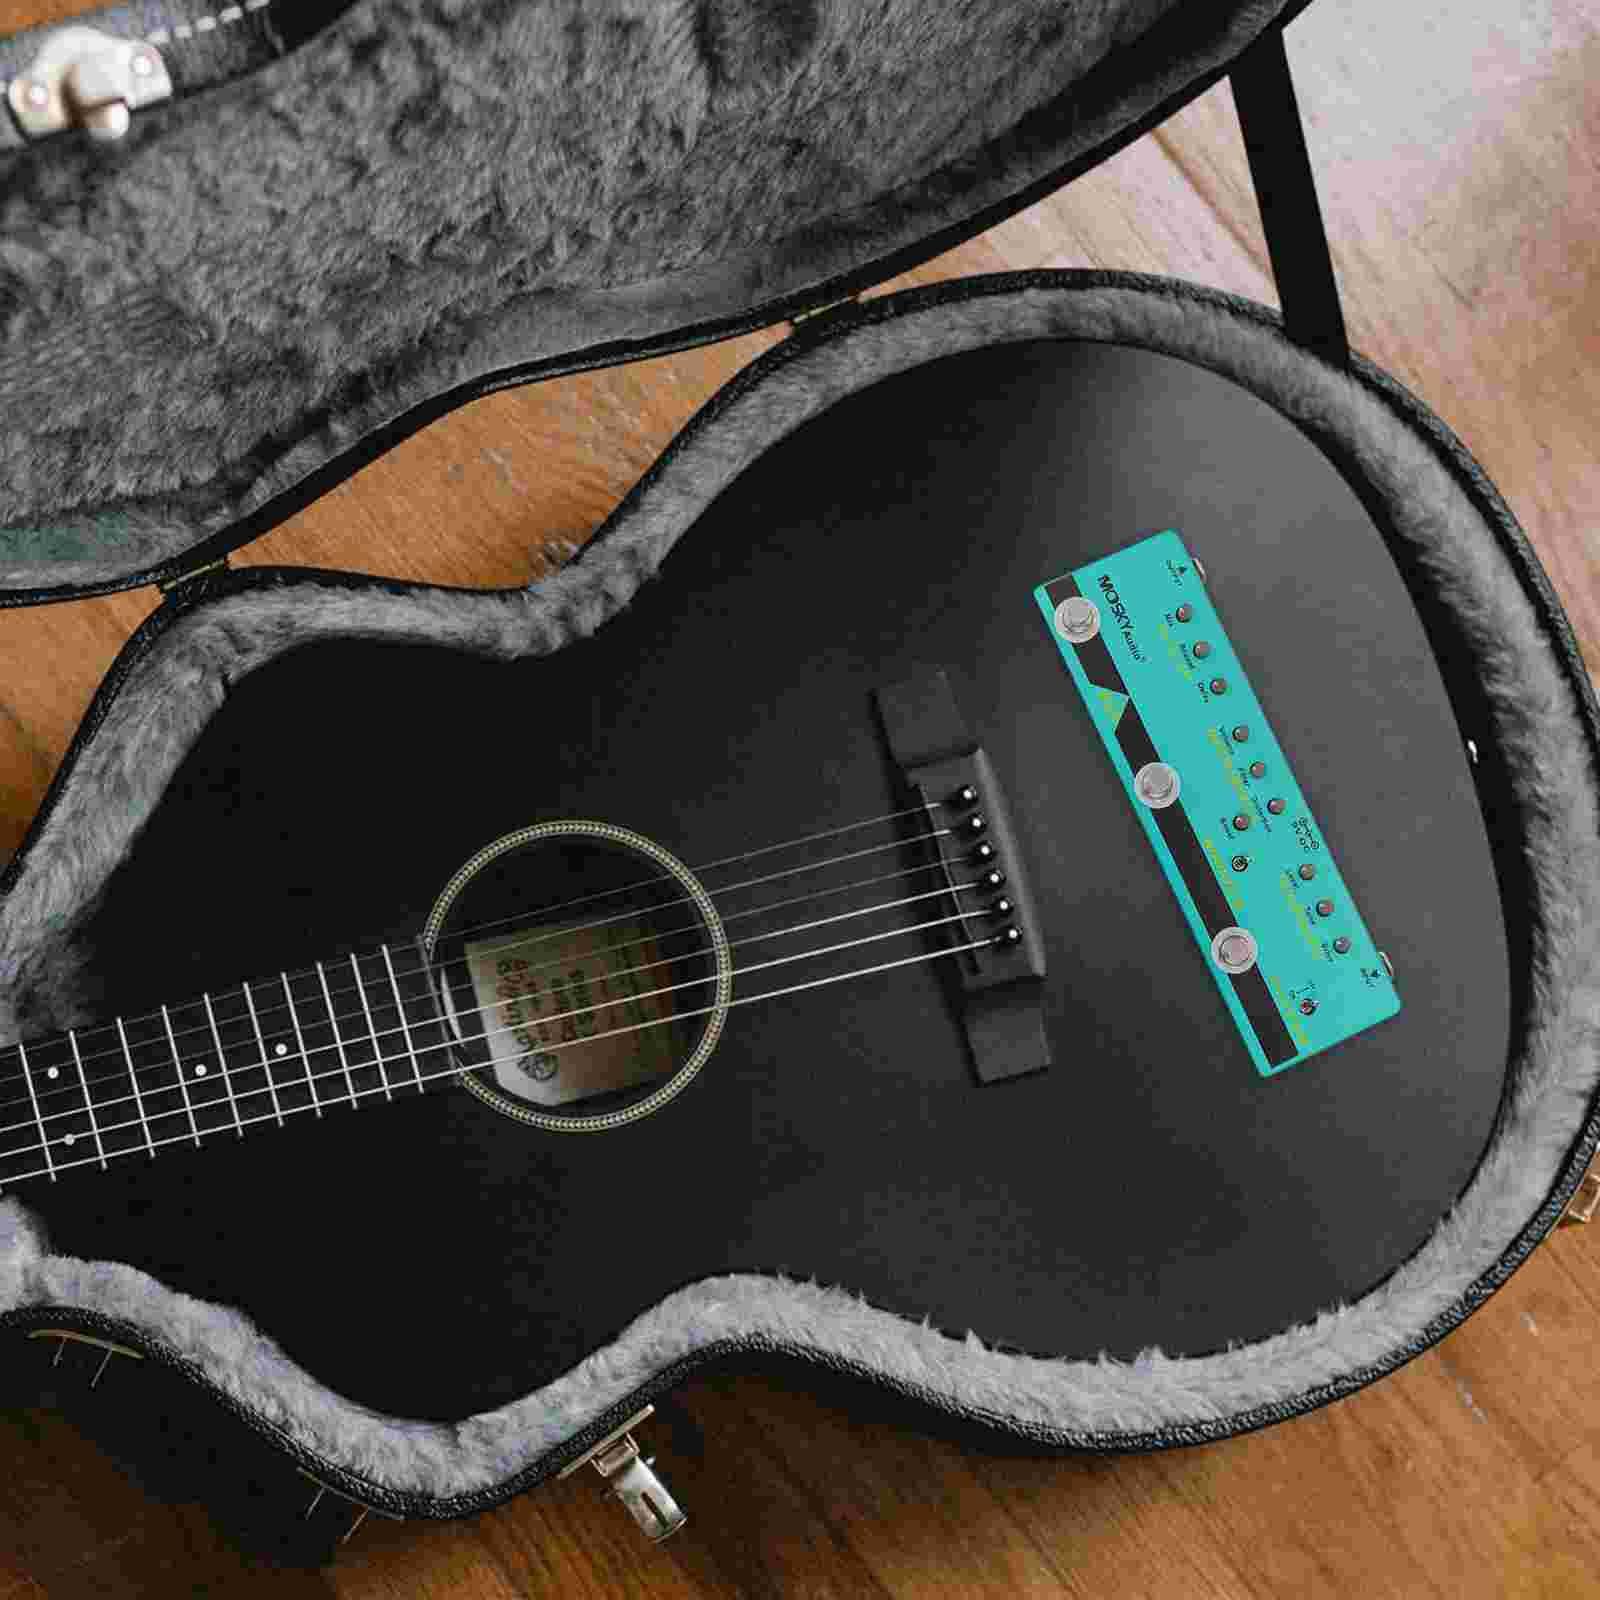 1pc Professional Guitar Effector Guitar Effect Processor Guitar Accessory (Sky-blue)